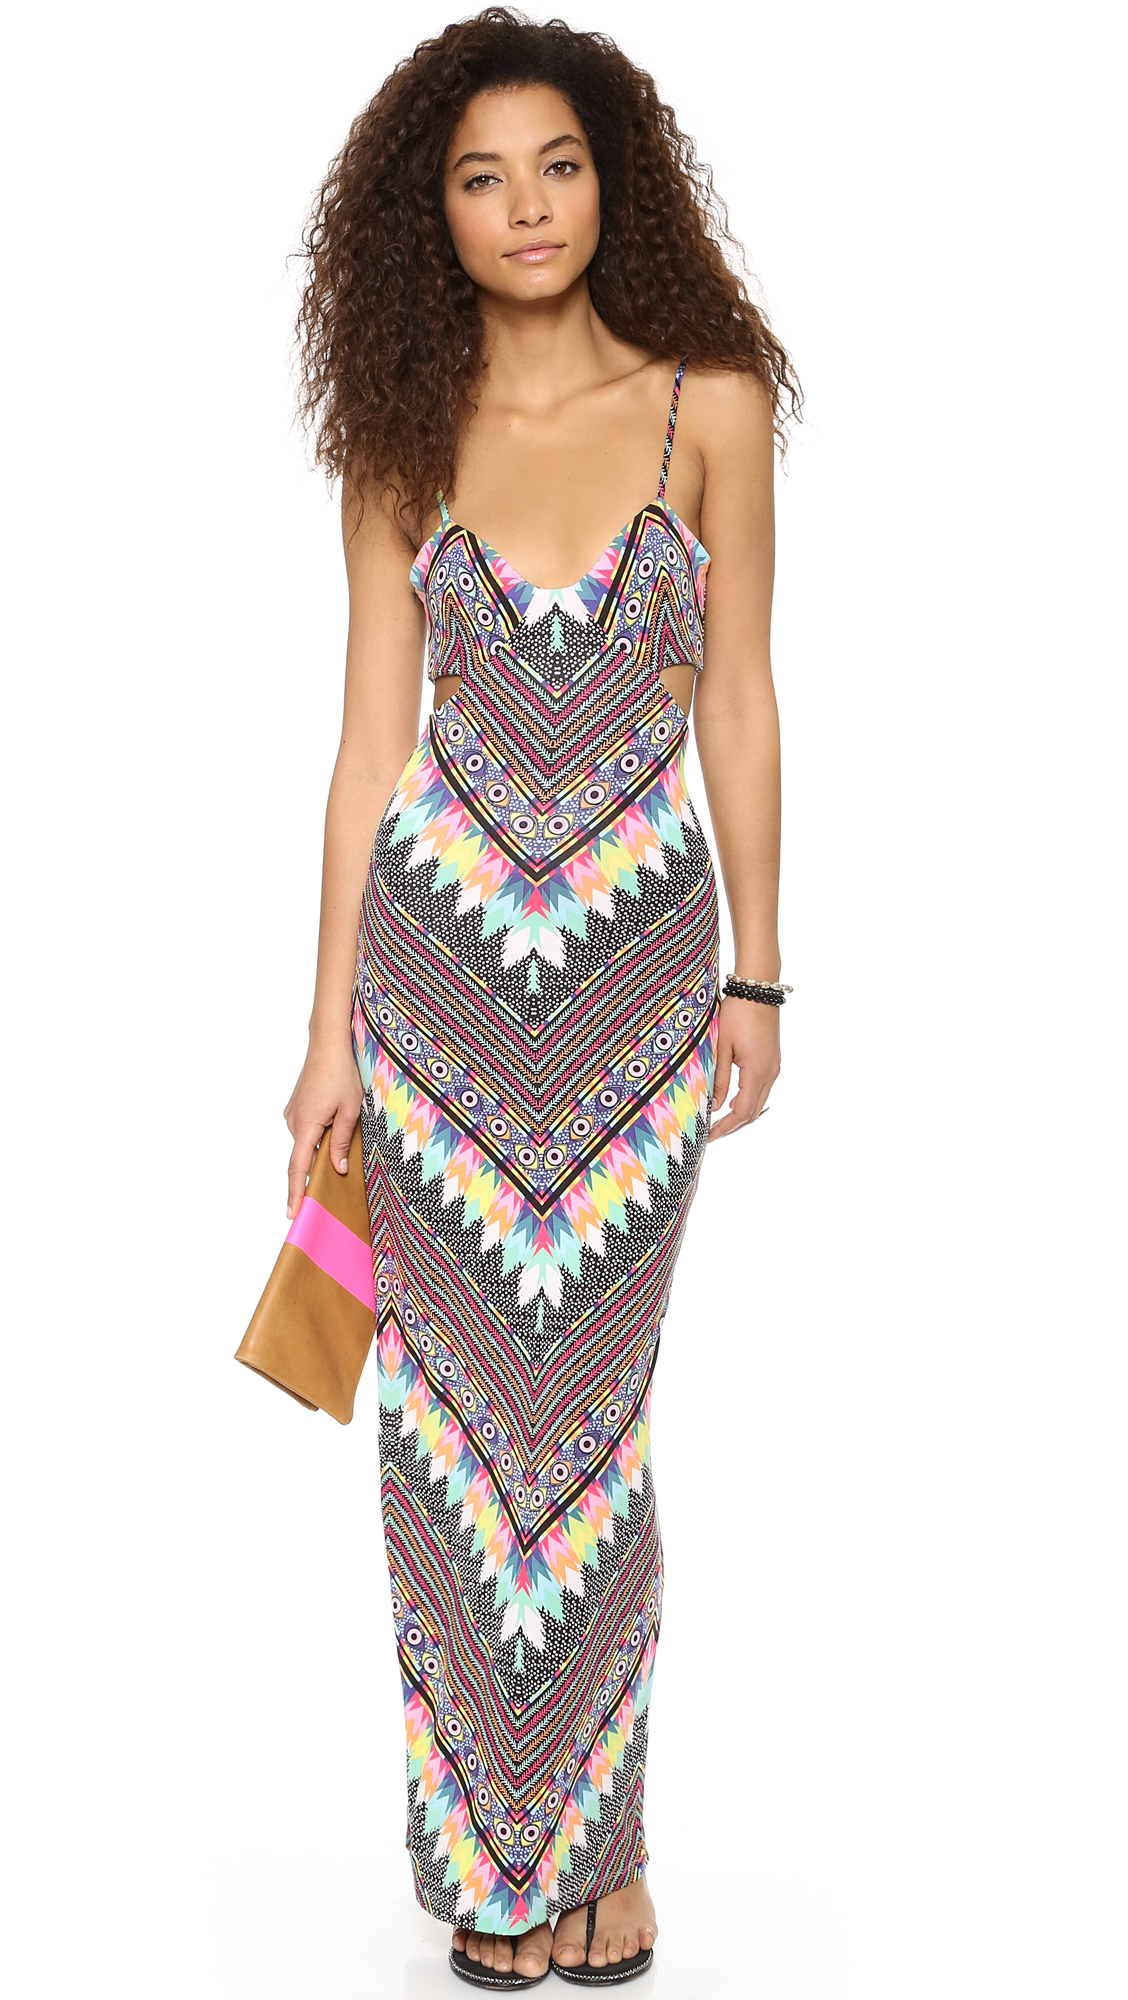 Mara Hoffman Divine Cut Out Maxi Dress In Multicolor